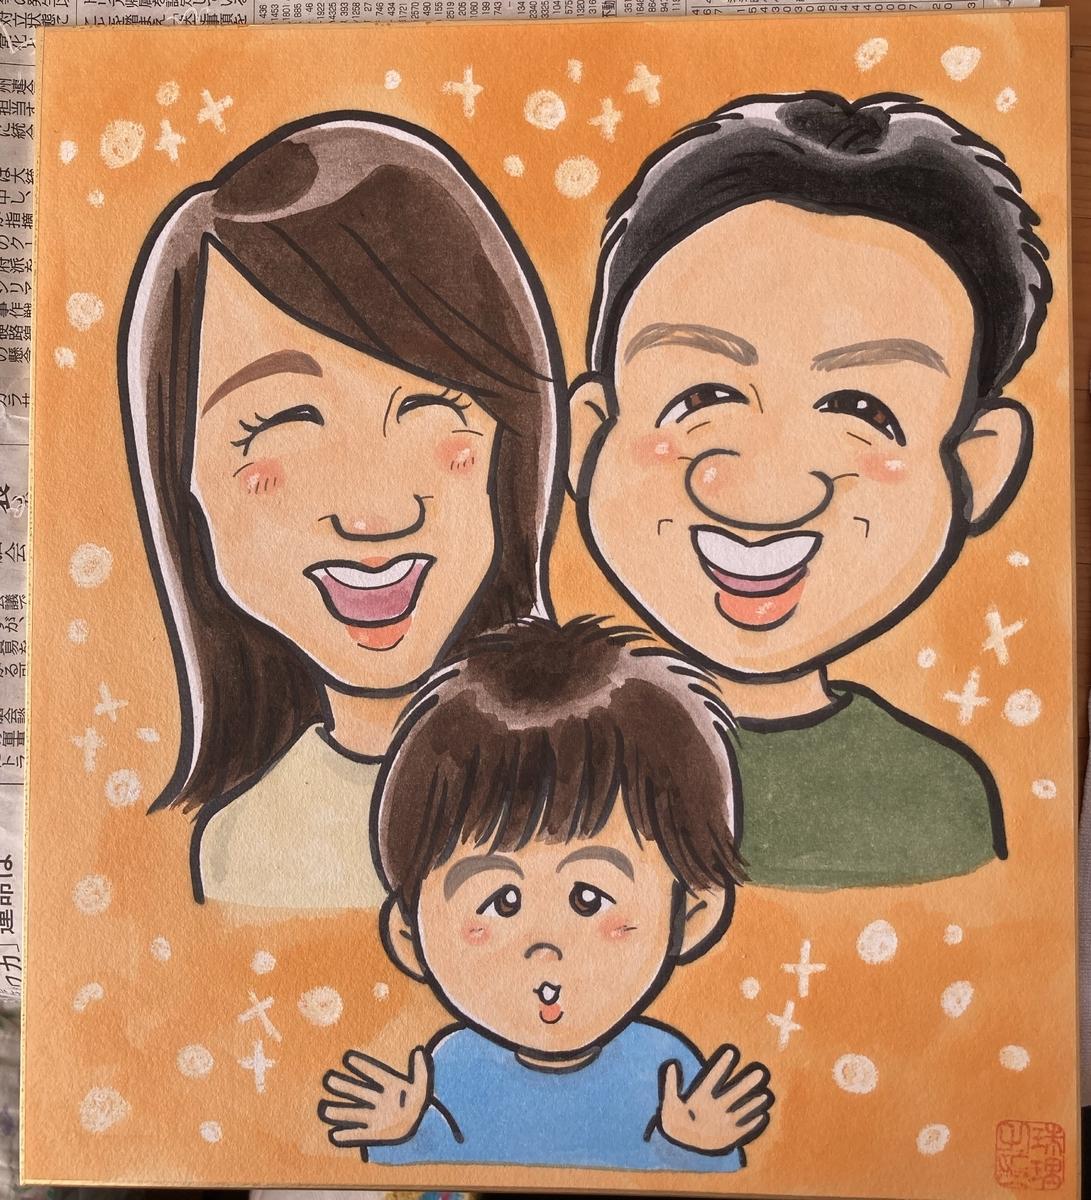 家族3人の手描き似顔絵